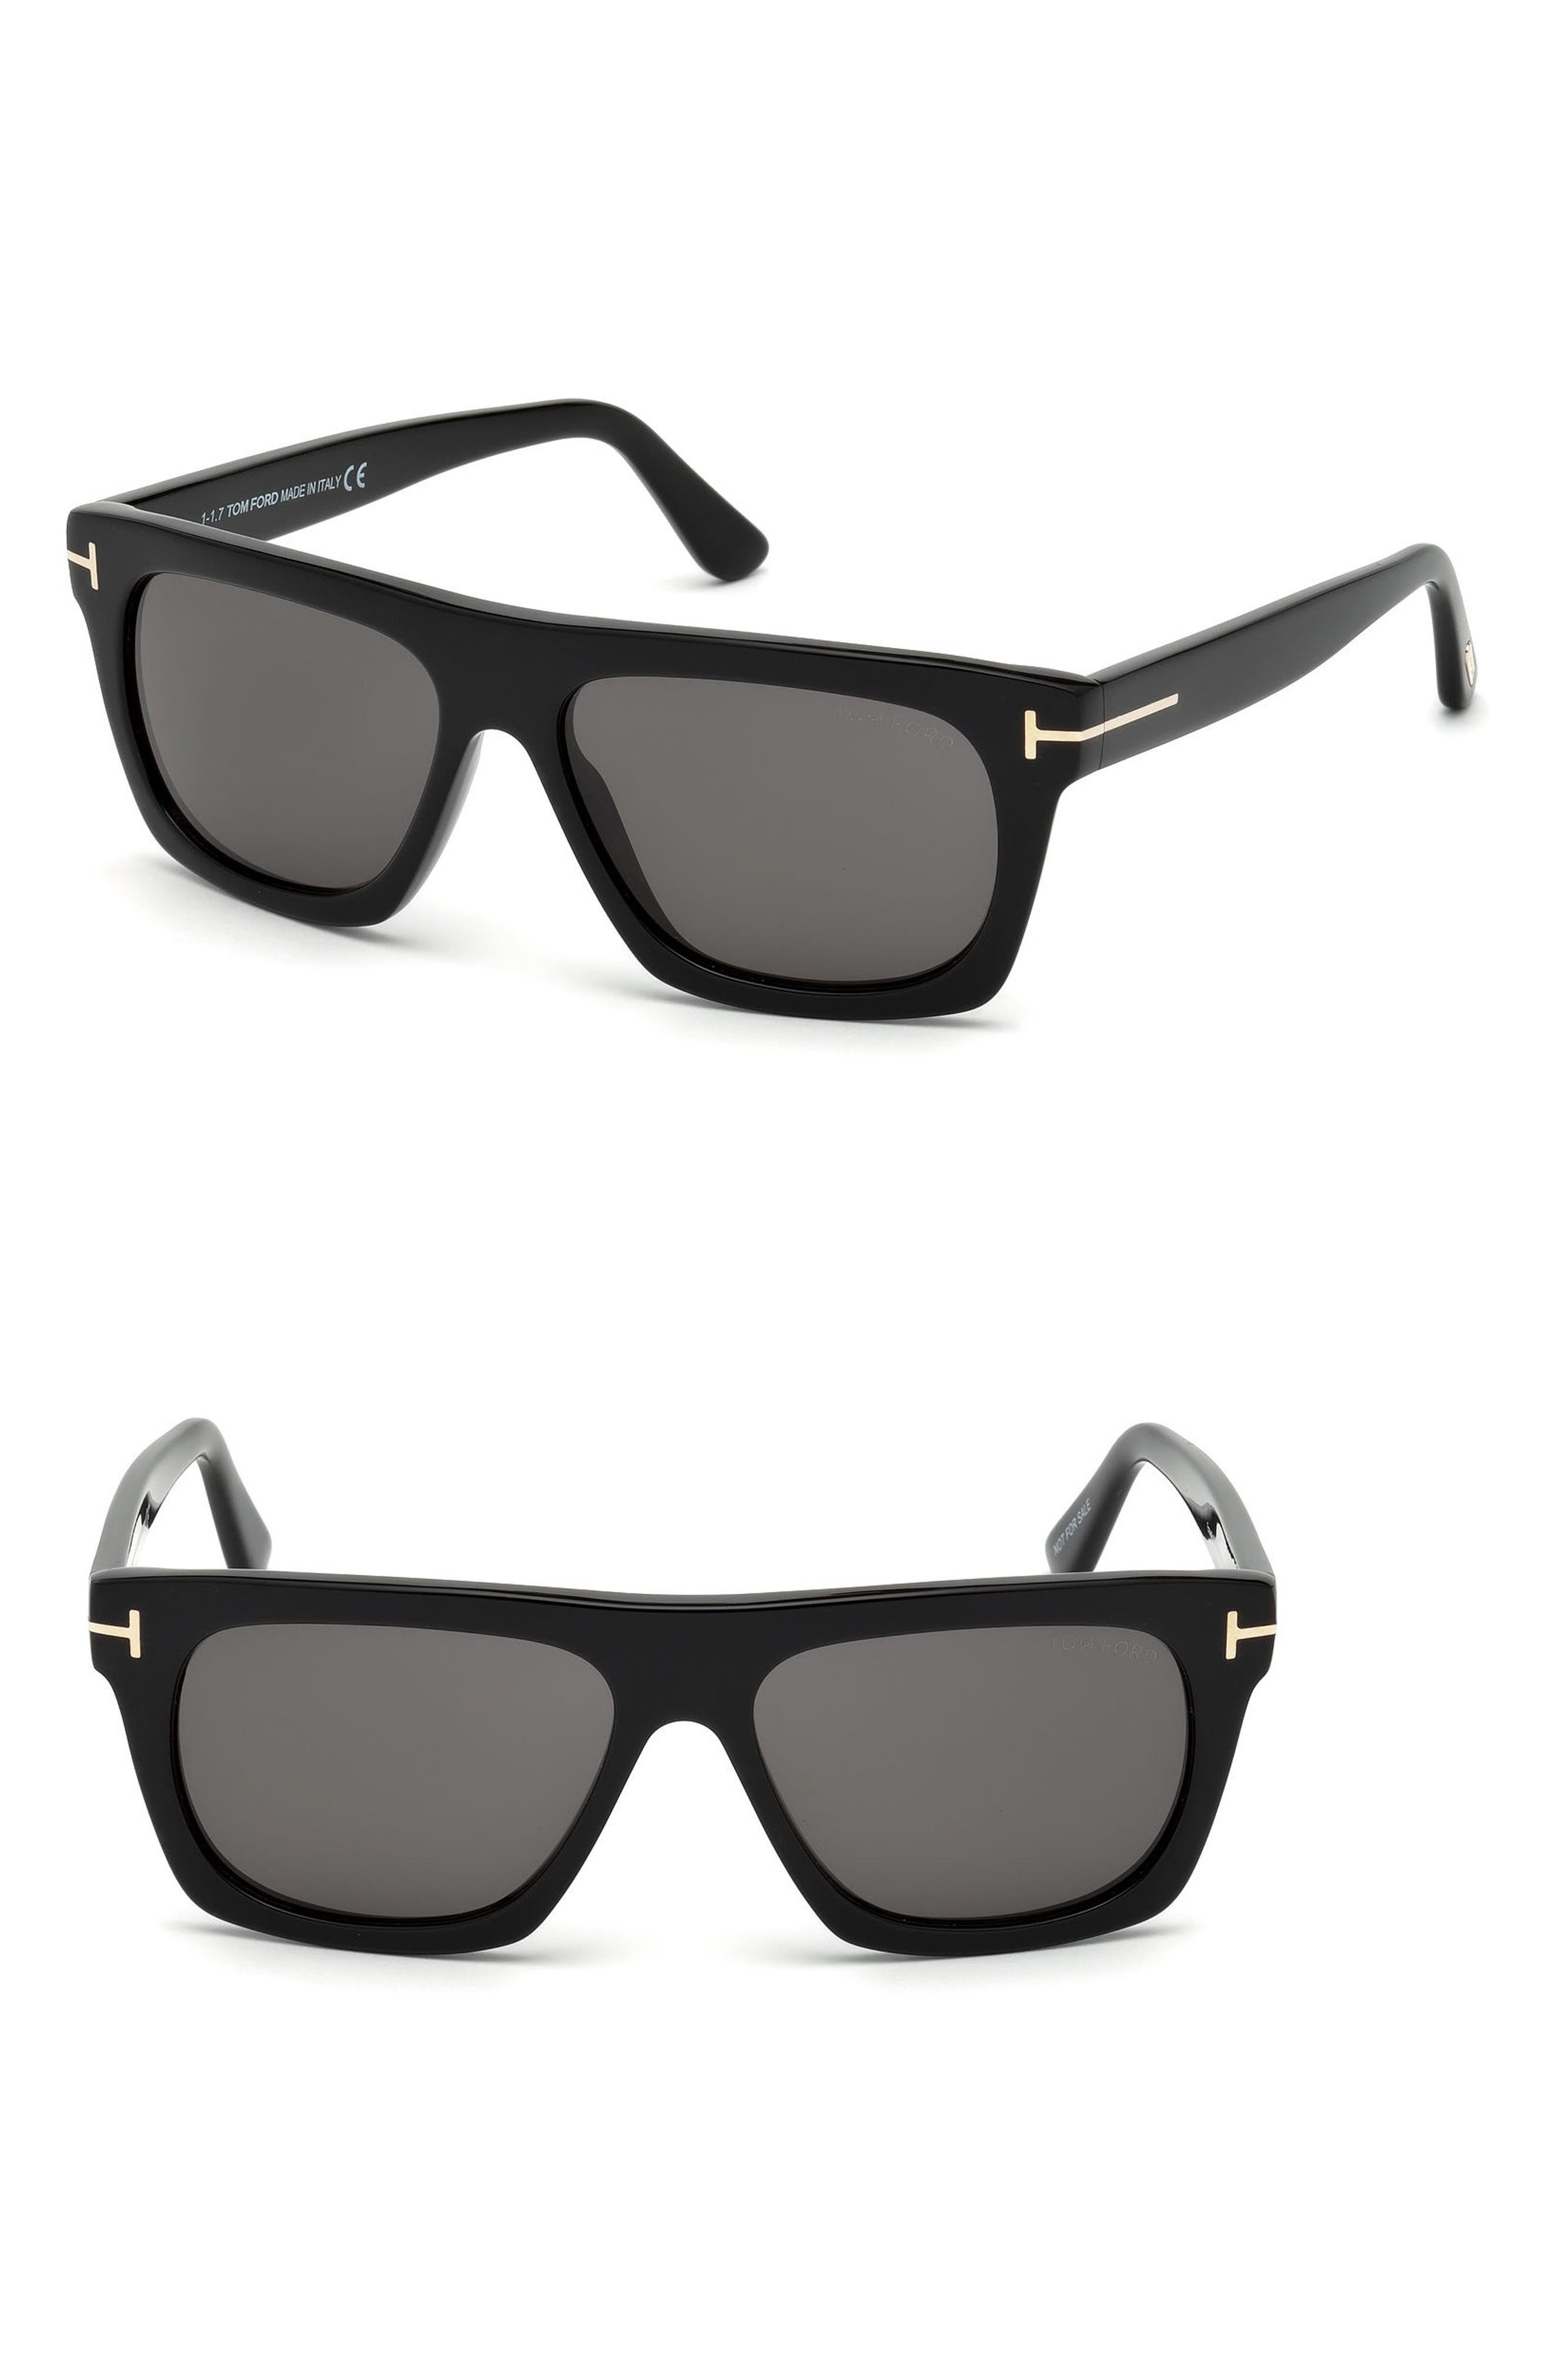 Tom Ford Ernesto 55mm Sunglasses